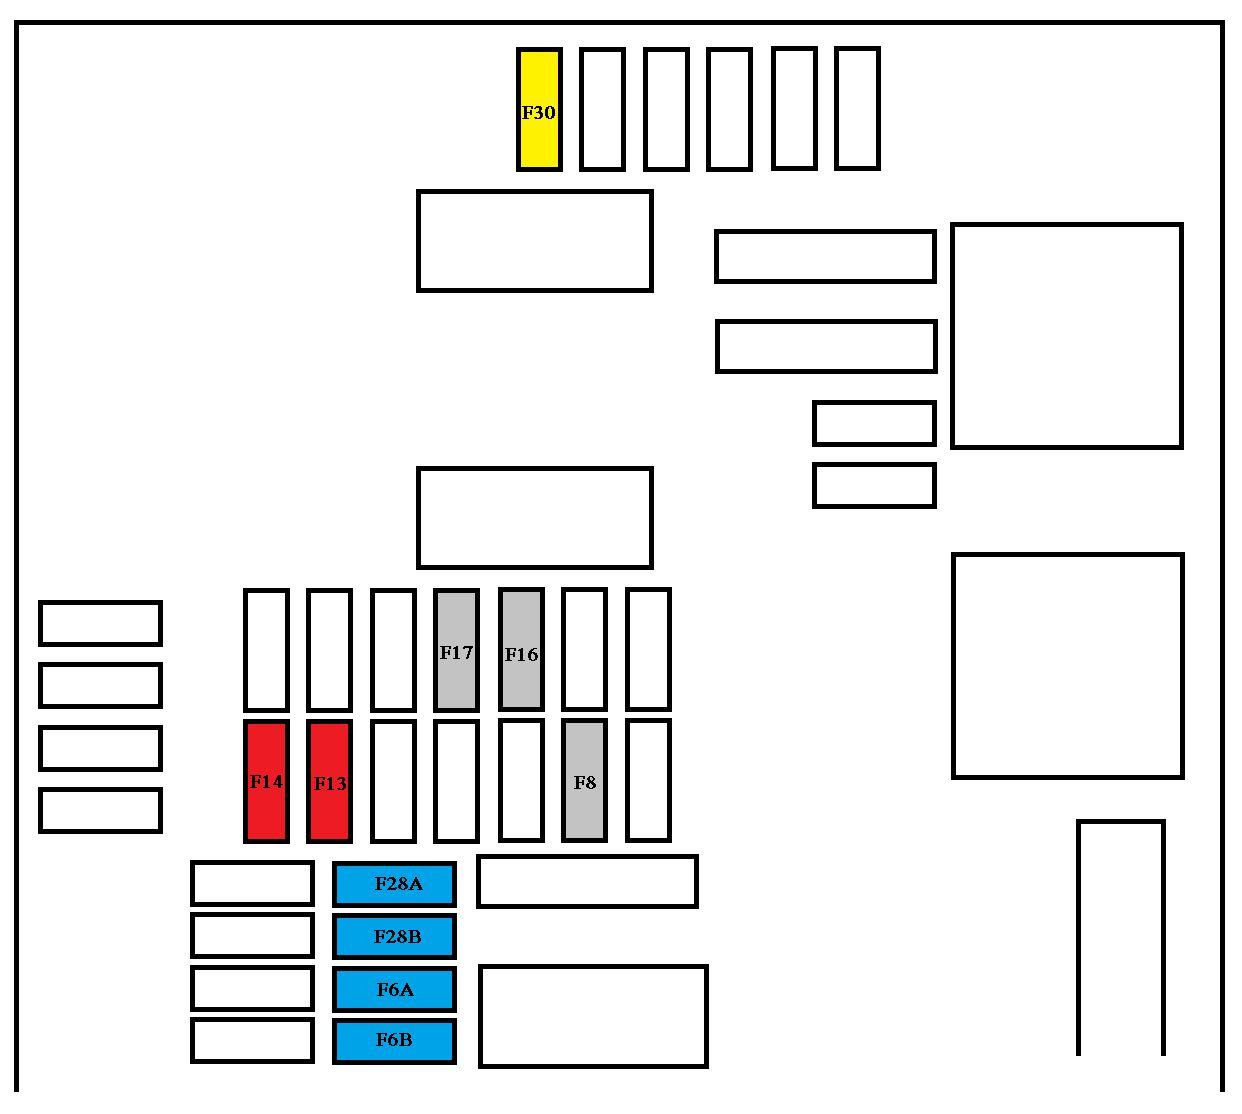 Peugeot 508 Radio Wiring Diagram Wiring Diagram Experts